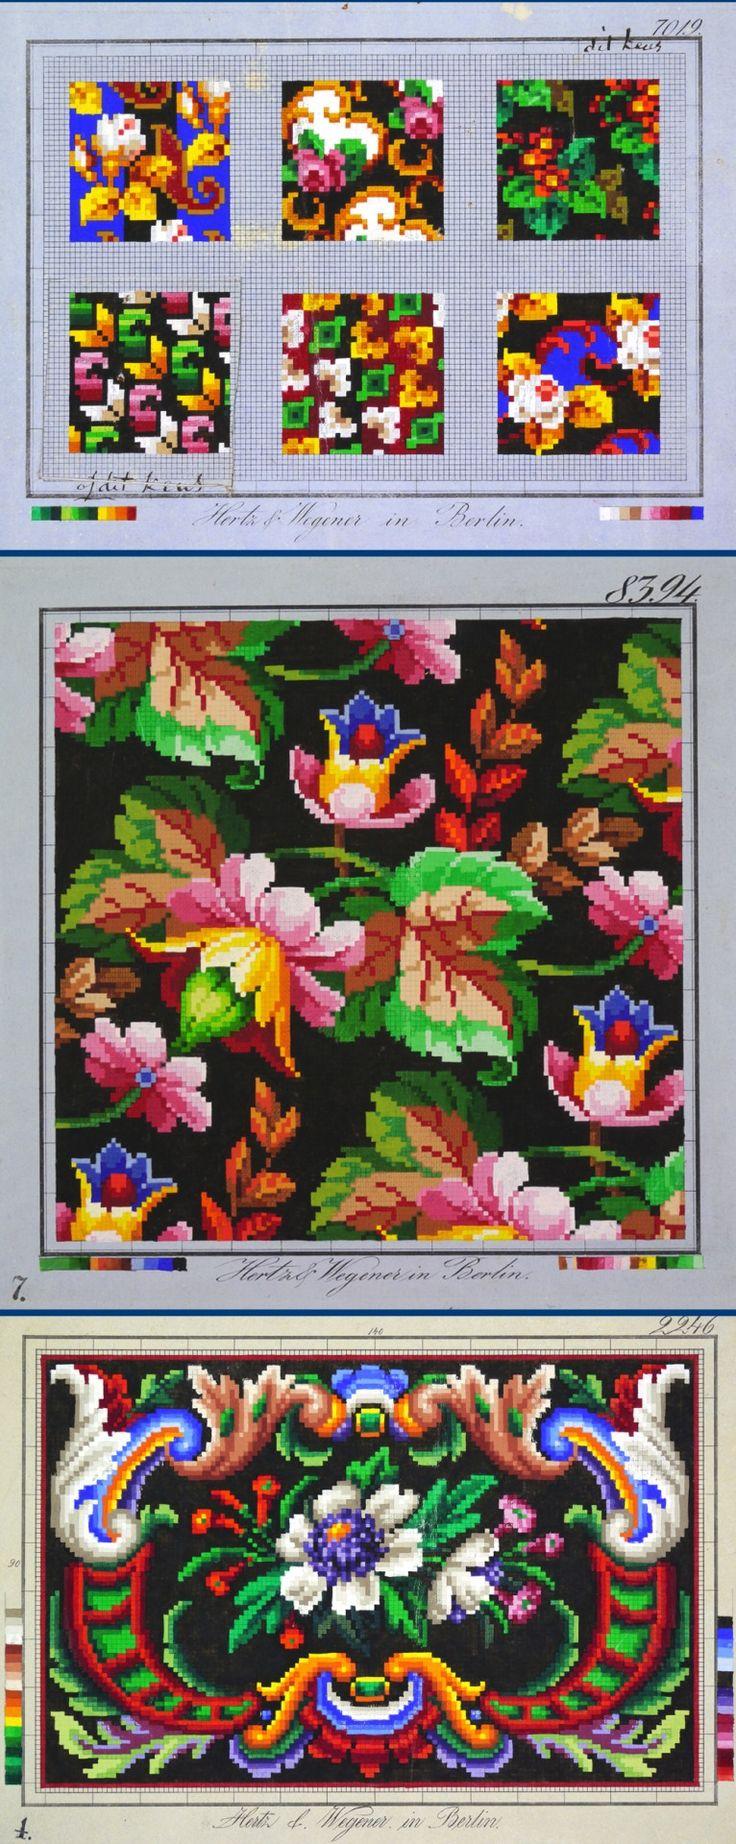 3 Berlin WoolWork Charts Produced By Hertz & Wegener Berlin ~ Dutch Eve On Textiles